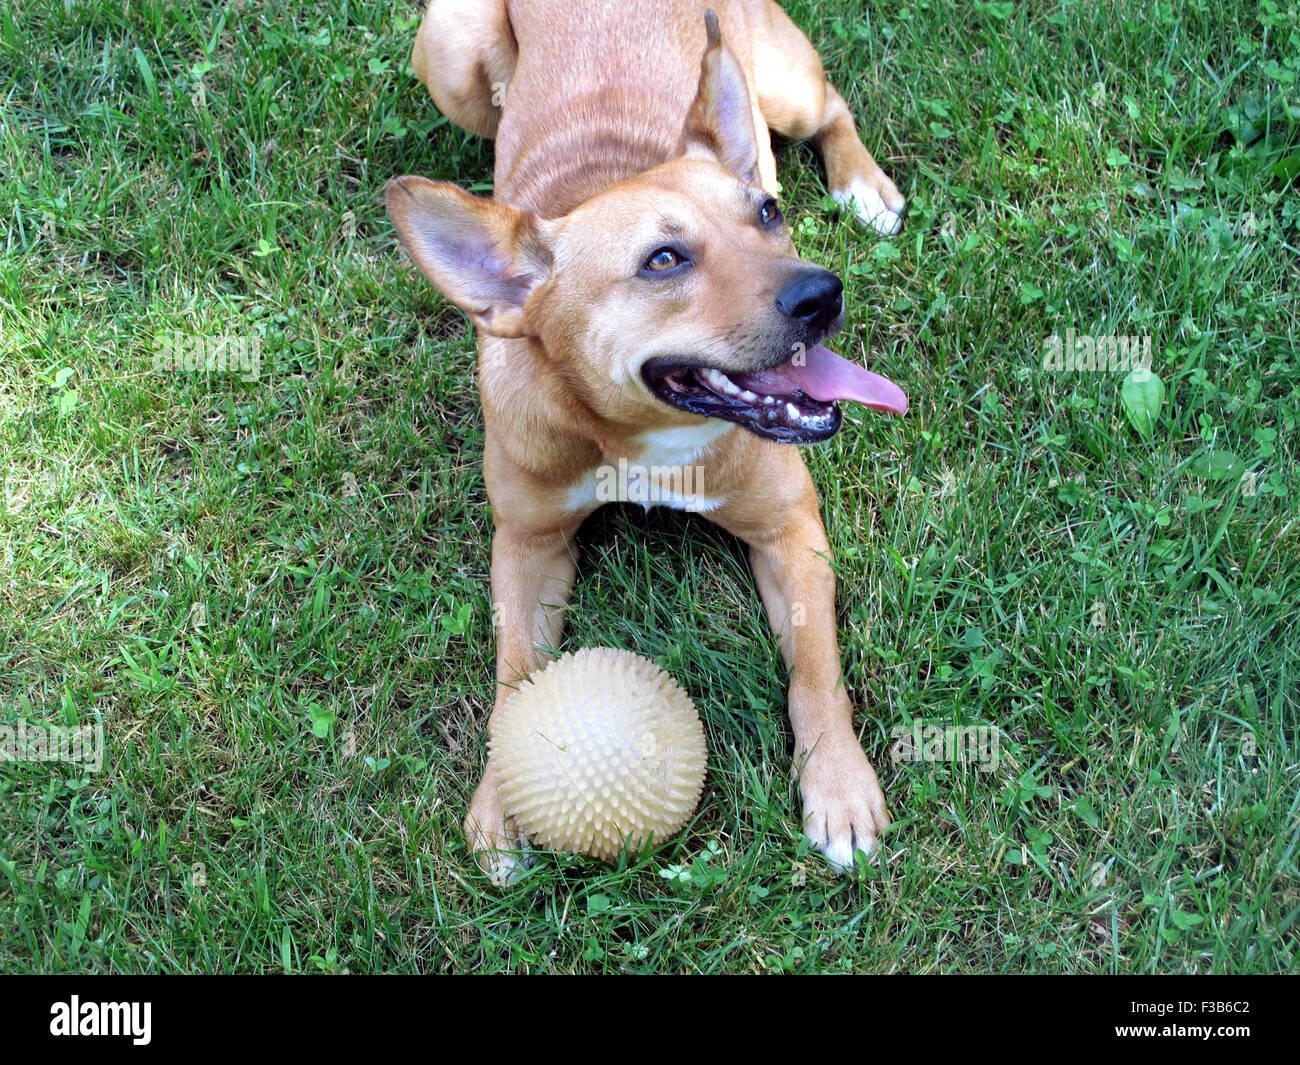 Smiling and panting Carolina dog playing with yellow ball on grass. - Stock Image